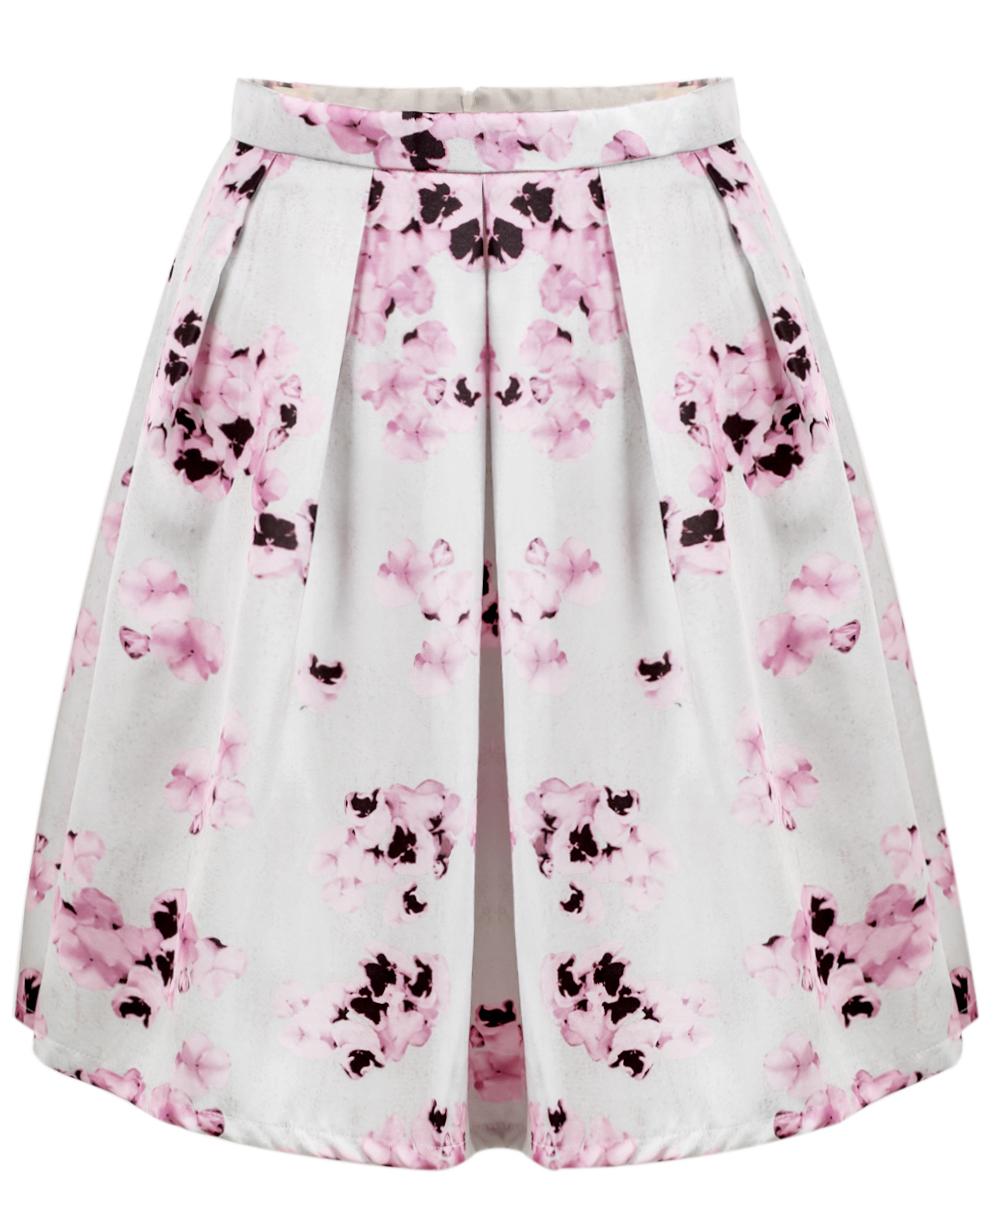 Pink Florals Print Pleated Shikt - Sheinside.com